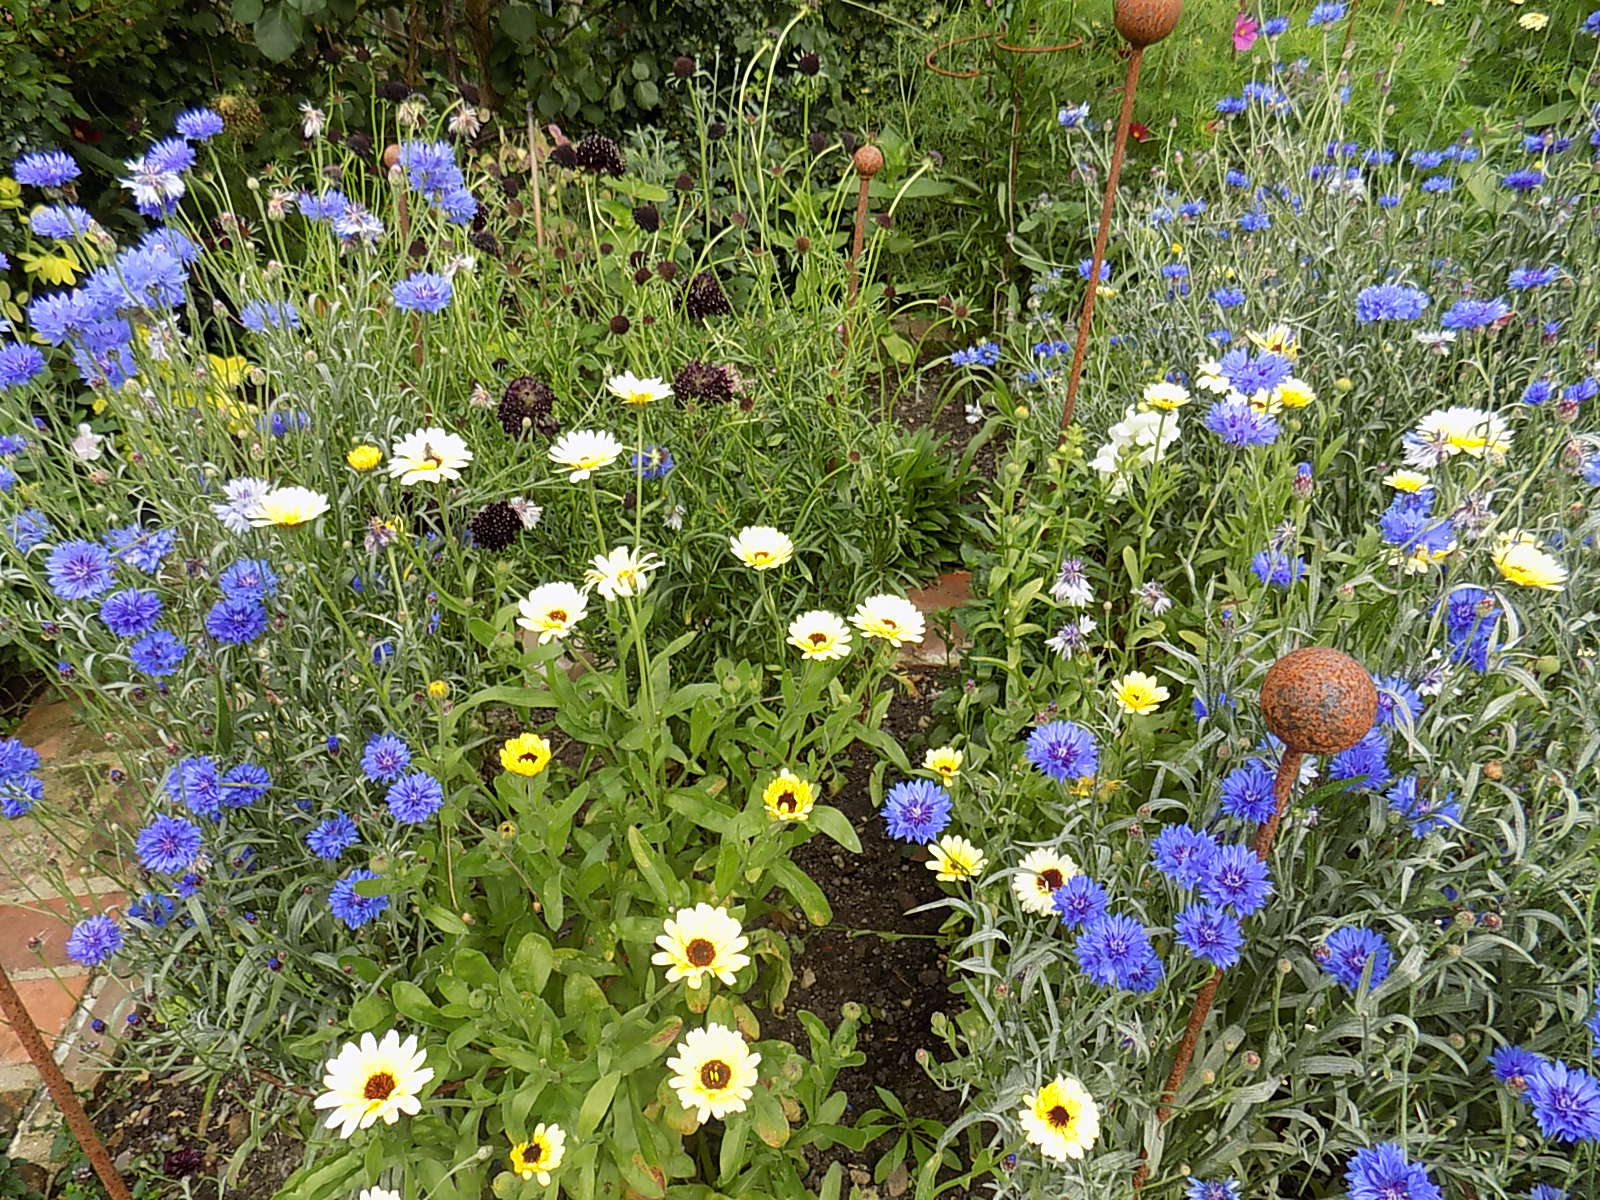 Cornflowers and Marigolds